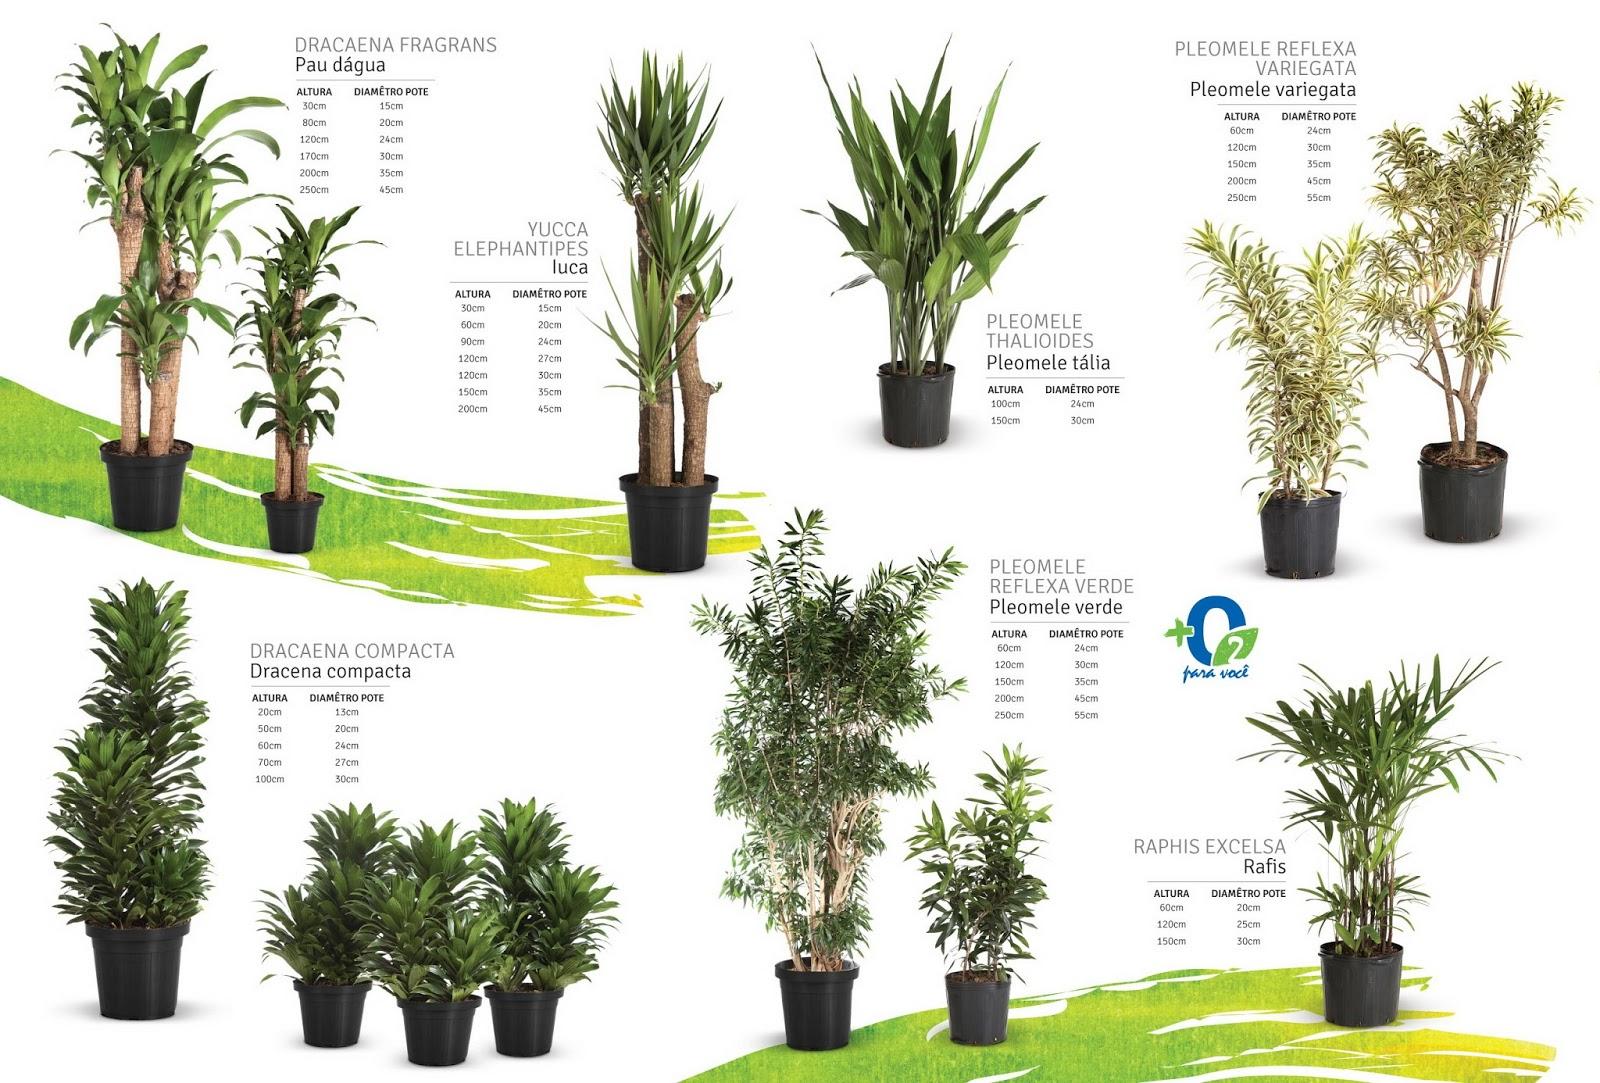 Catalogo mostra os principais produtos boa vista plantas for Catalogo de flores de jardin